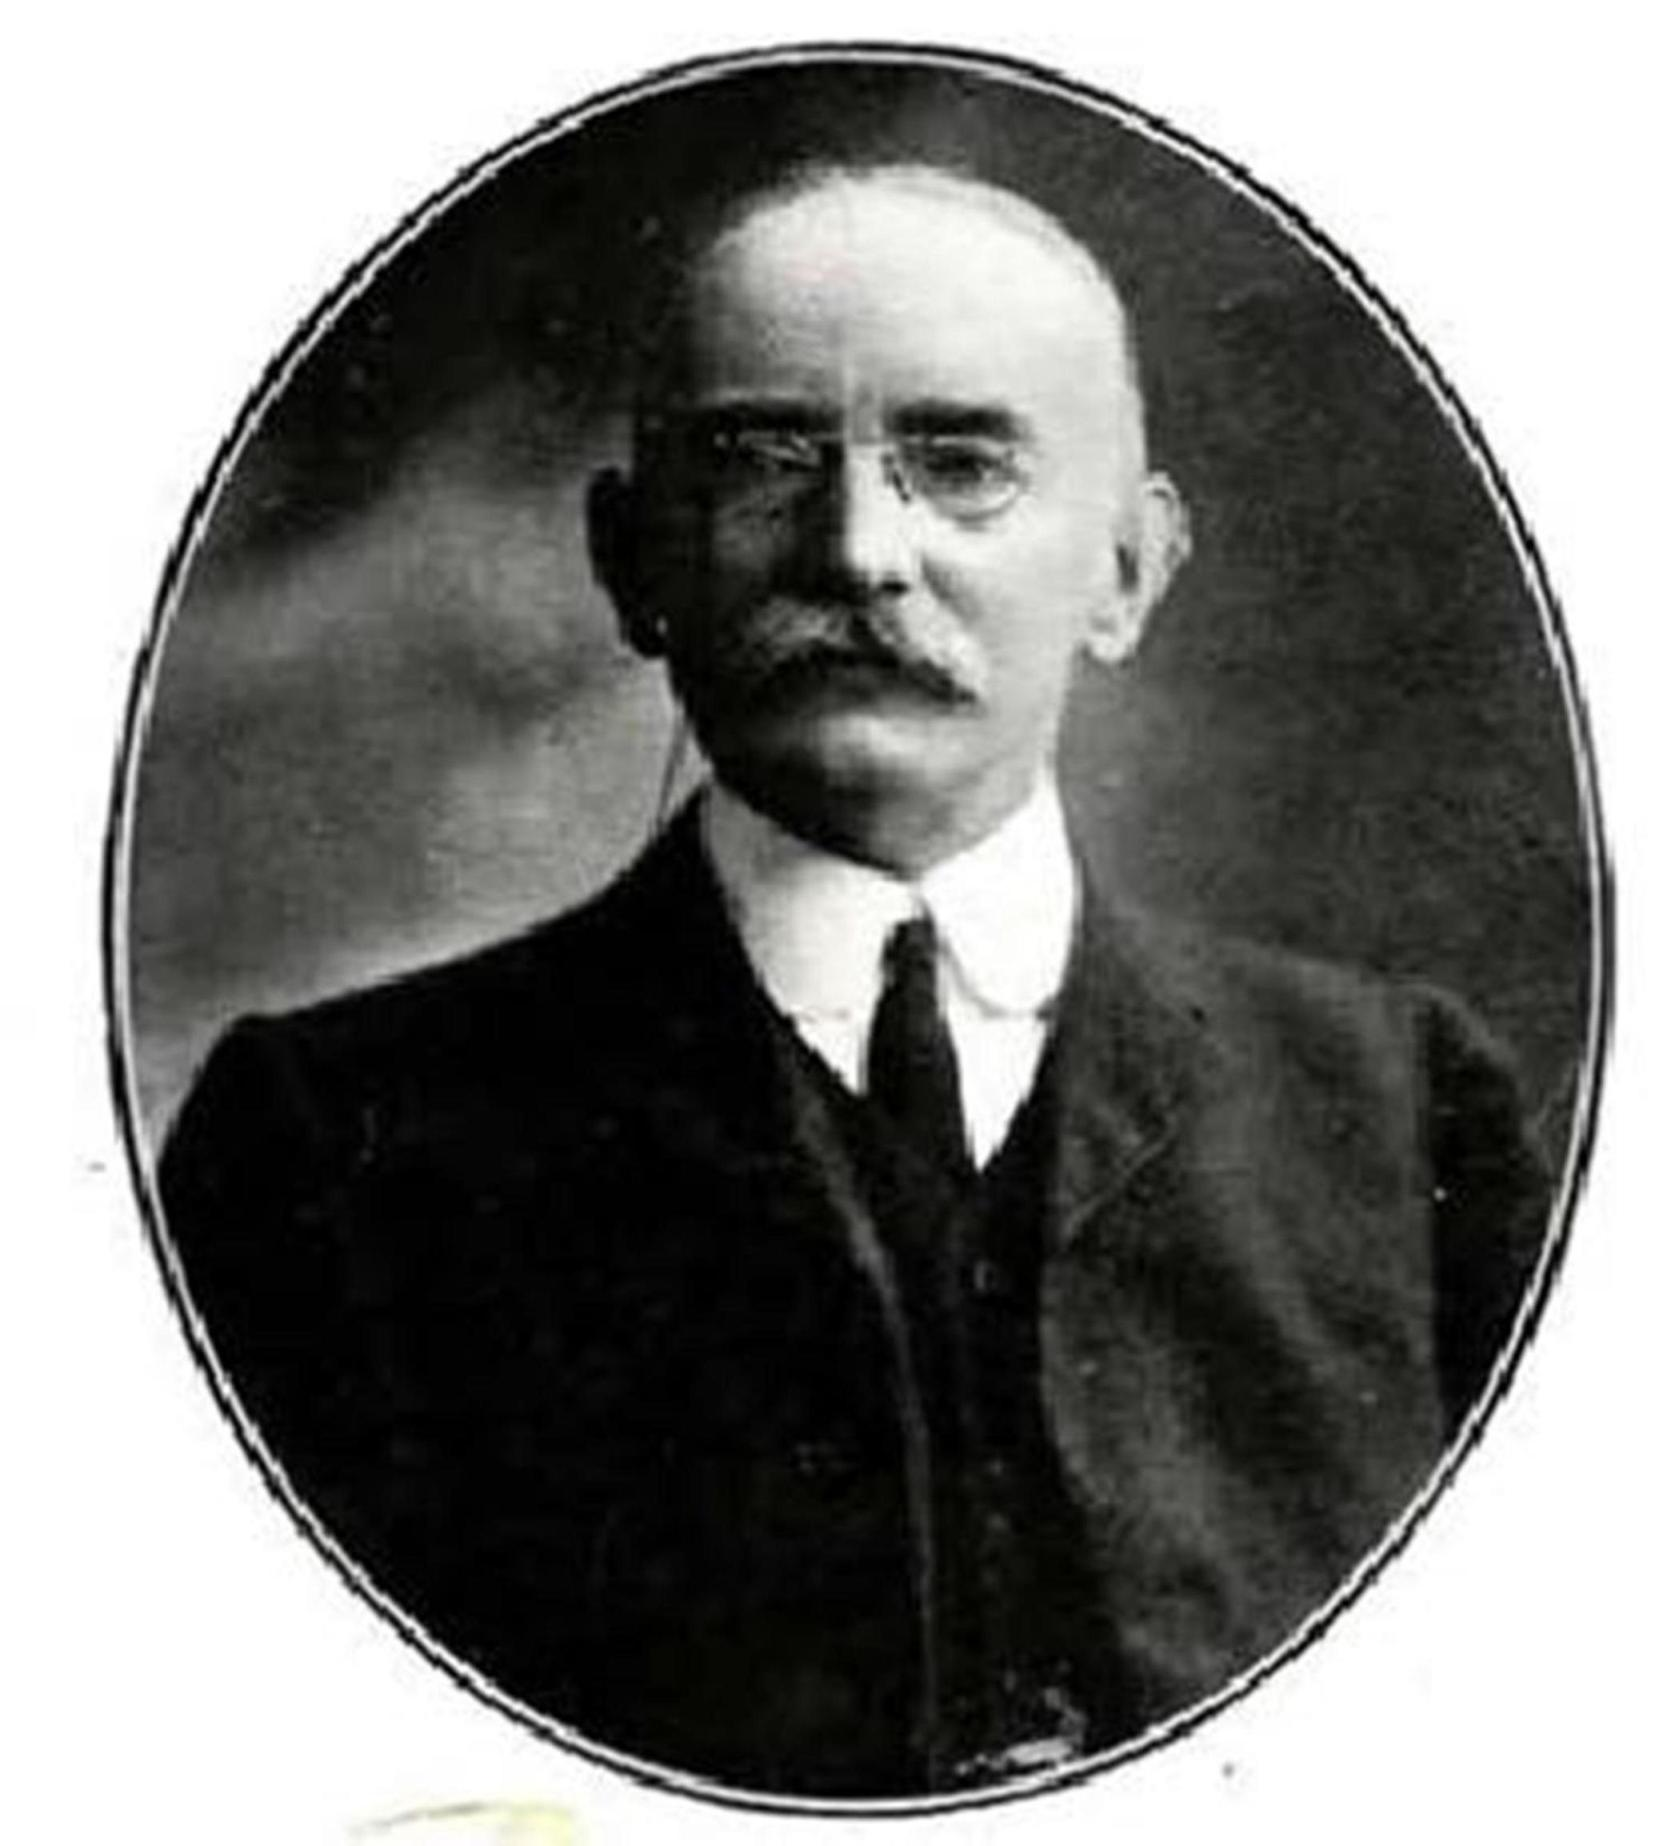 807b. Samuel Hynes